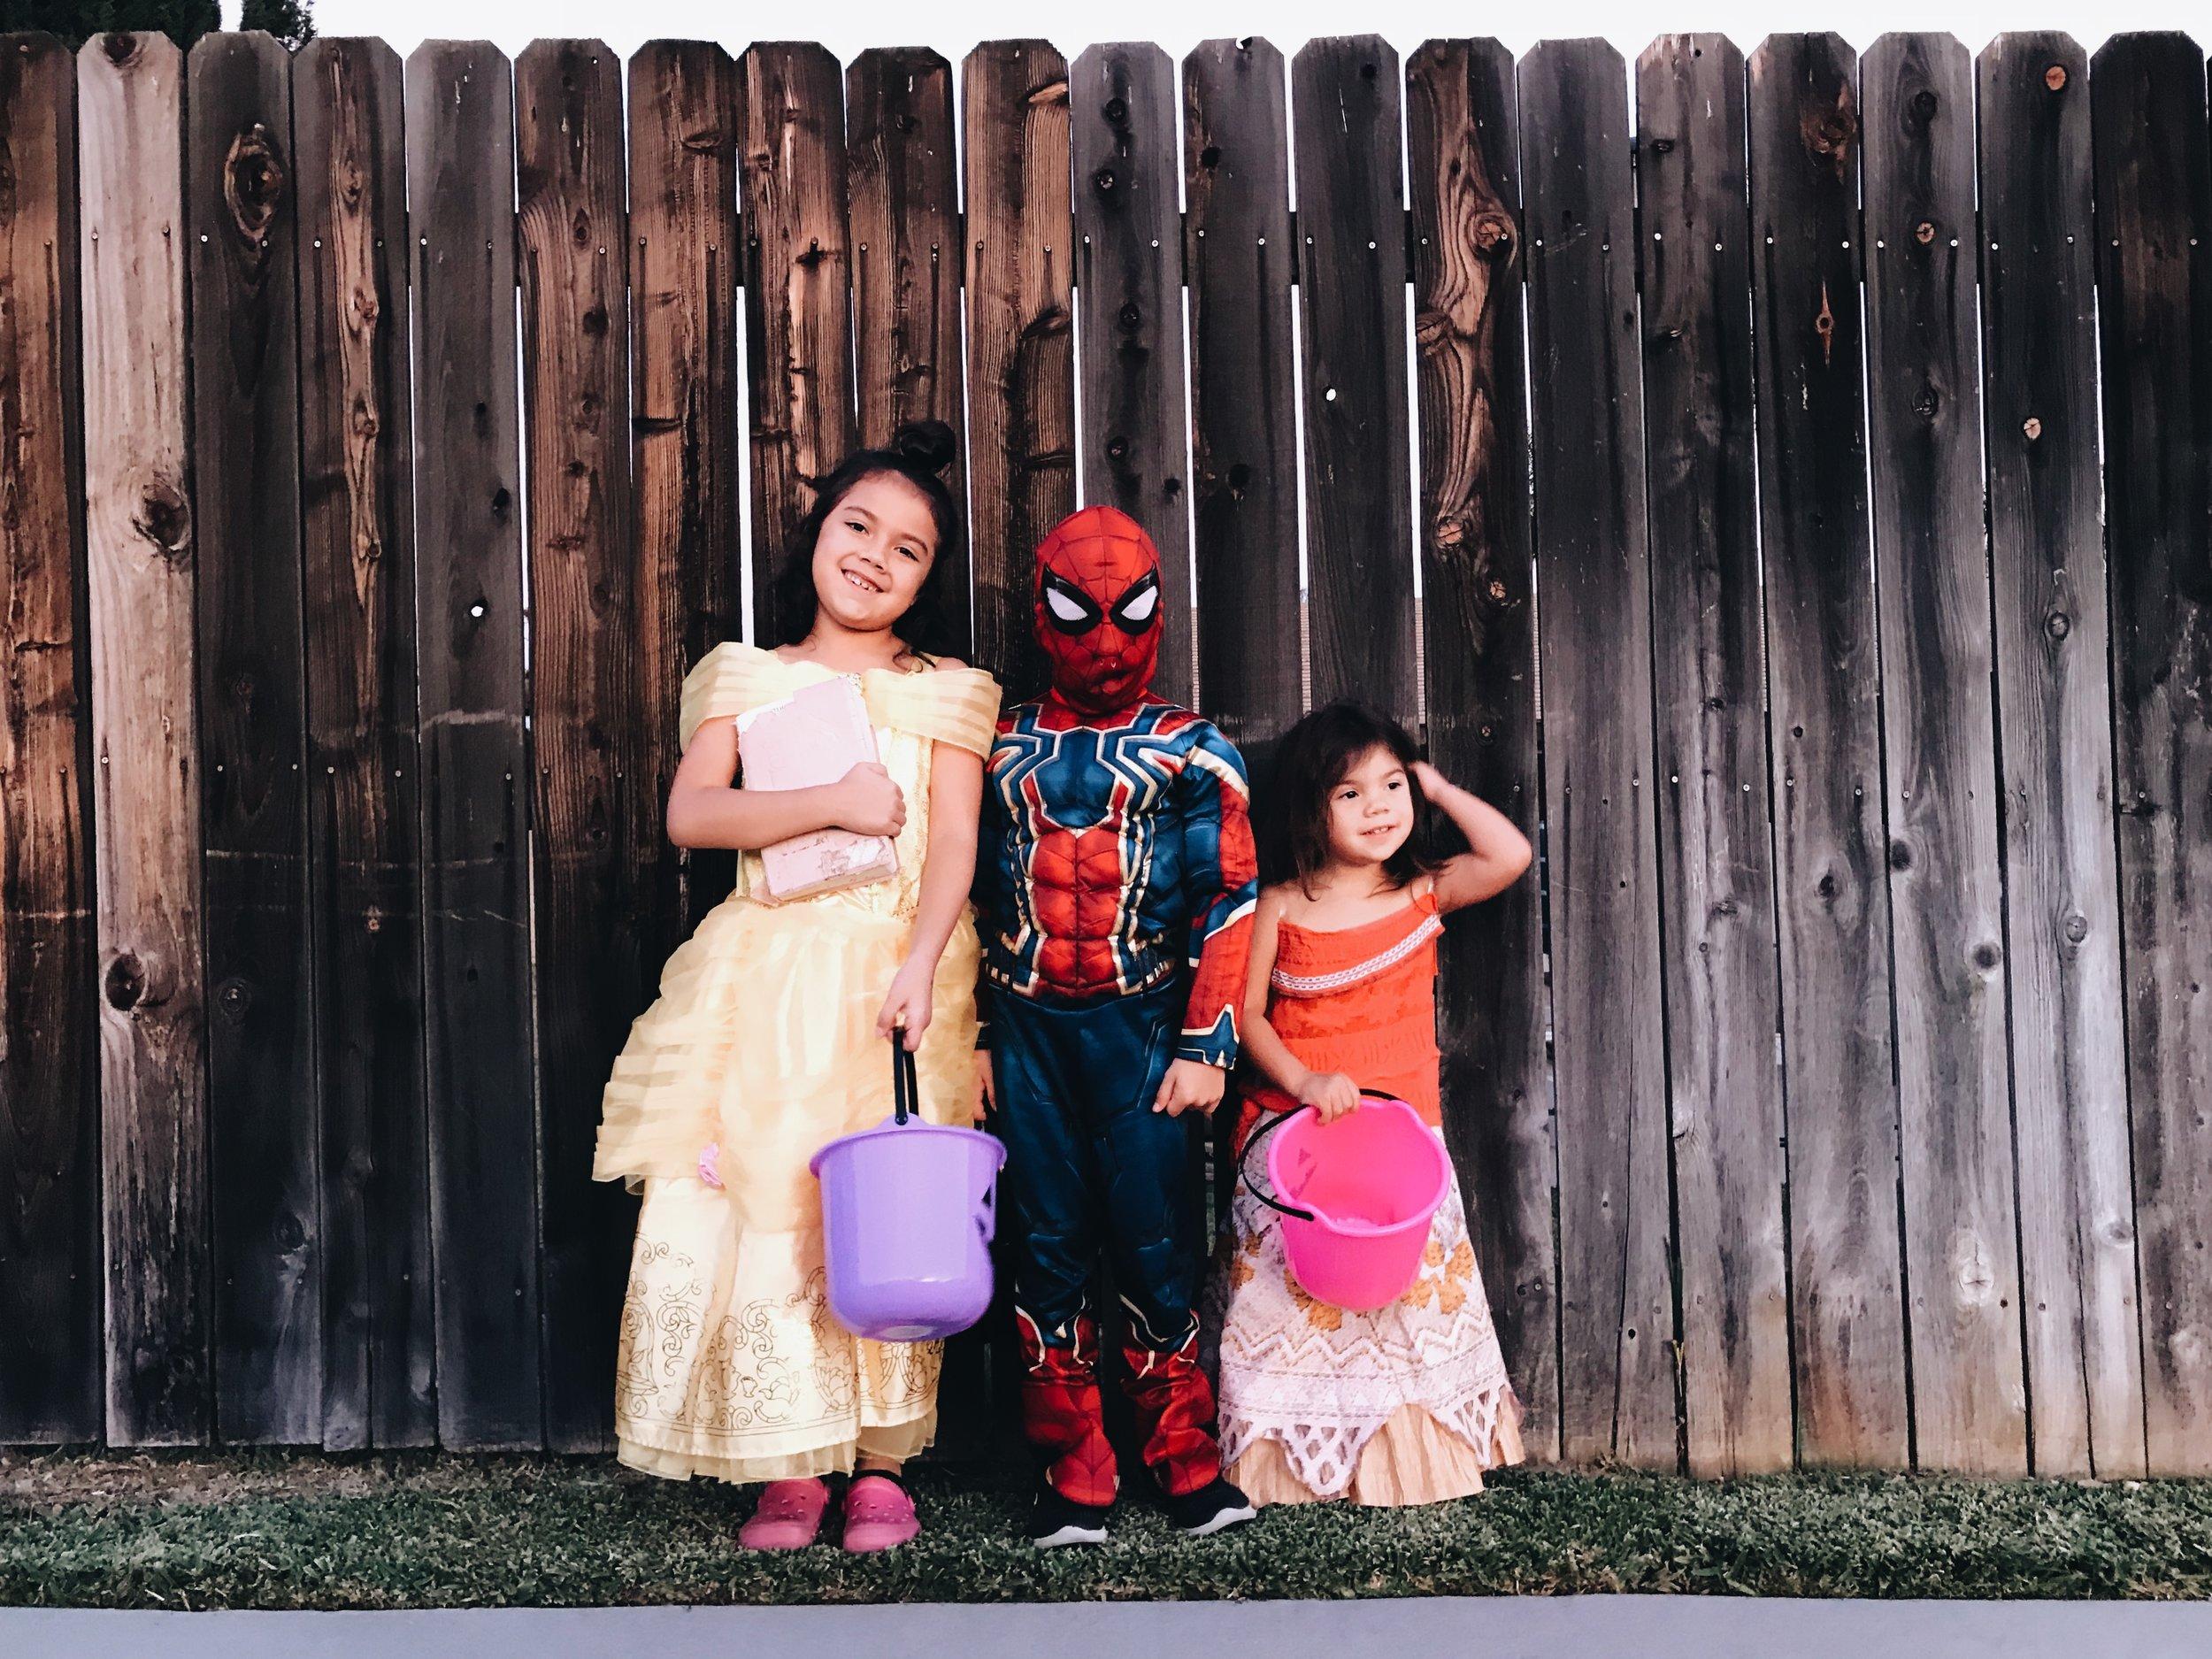 dress up activity for kids.JPG